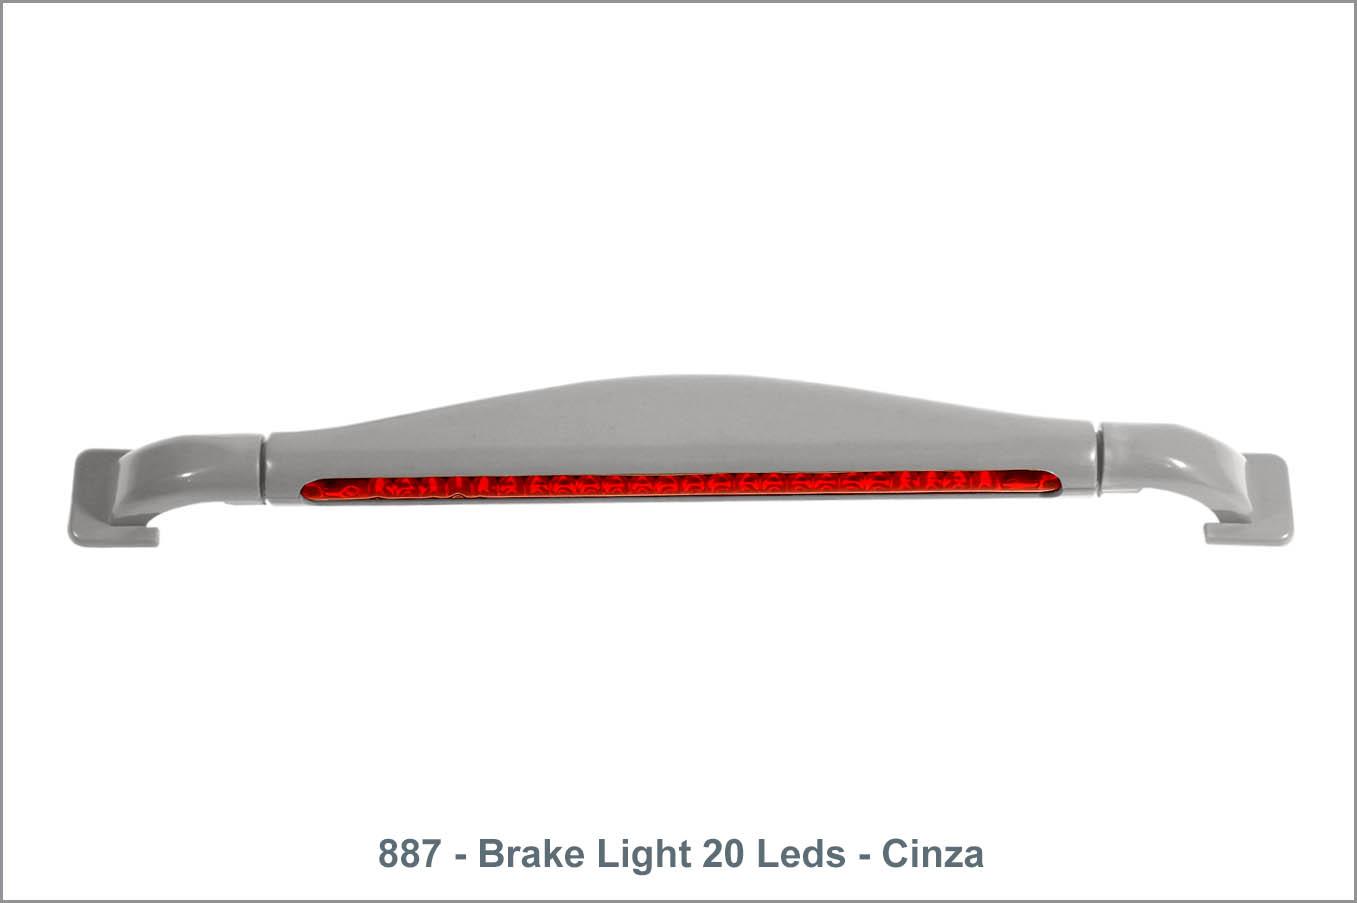 887 - Brake Light 20 Leds - Cinza